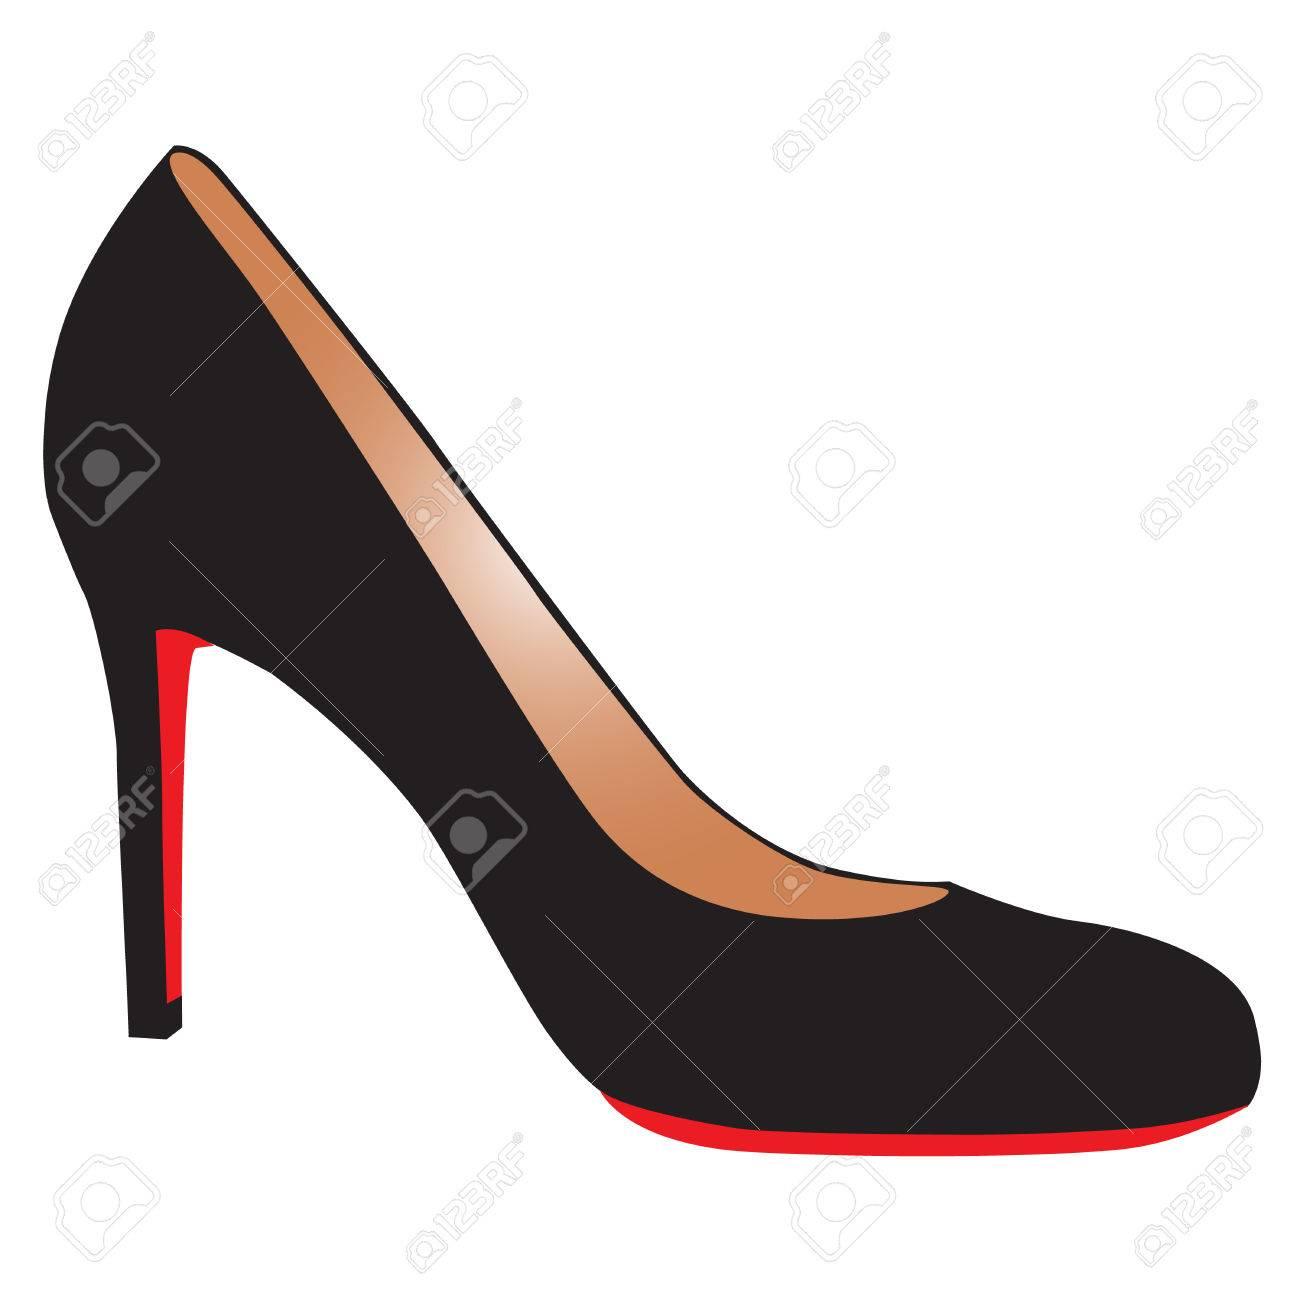 b2995c7e83e sexy black high-heel shoe with red sole